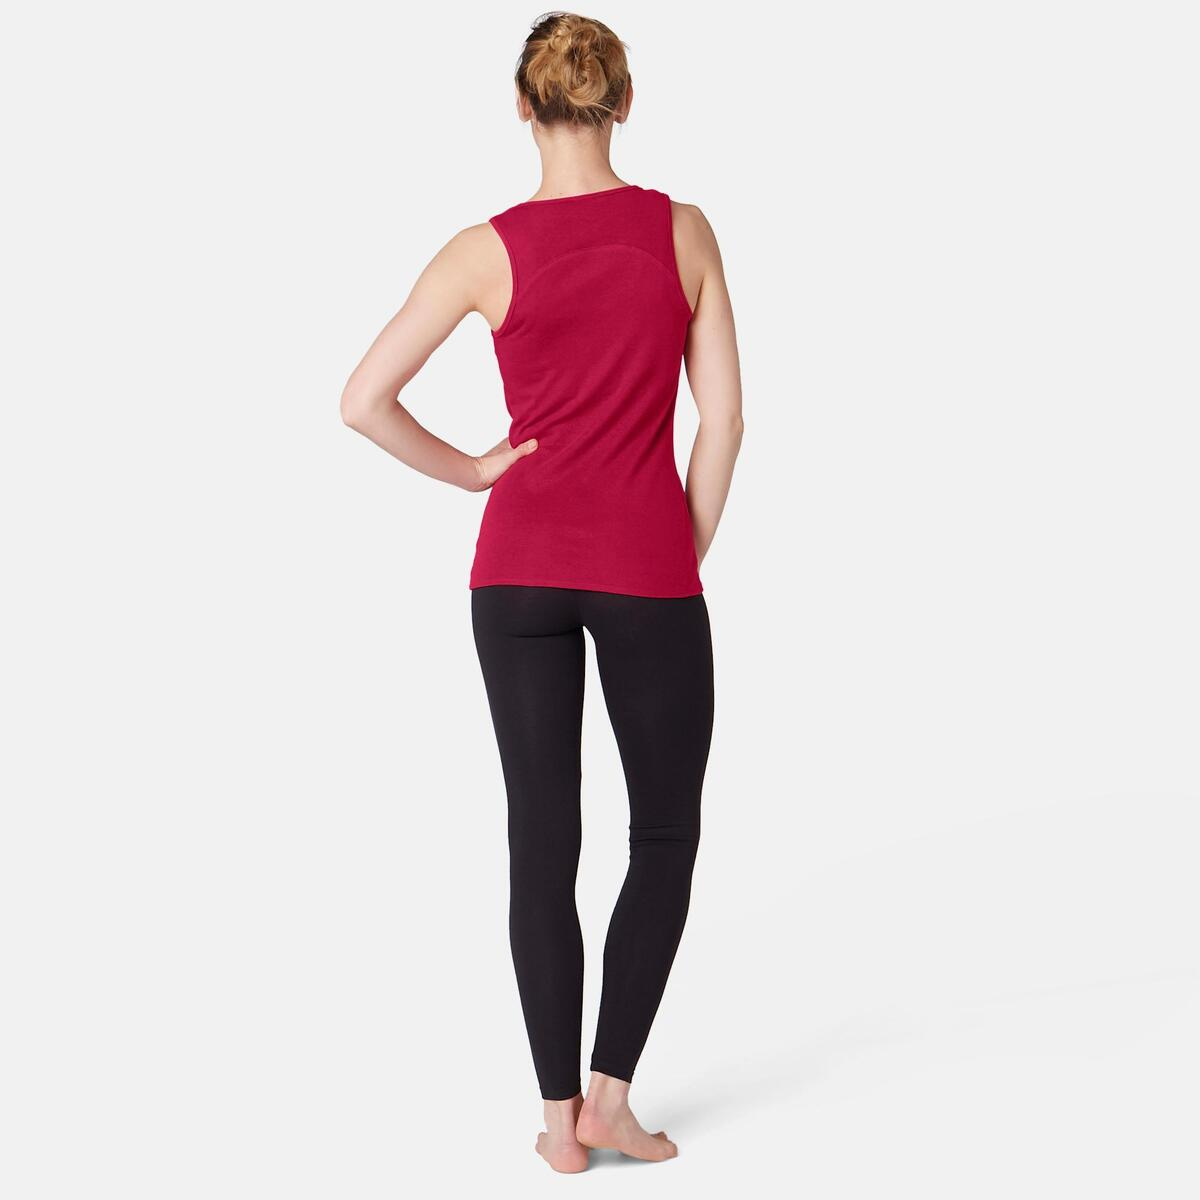 Bild 4 von Tank-Top 500 Pilates & sanfte Gymnastik Damen bordeaux meliert